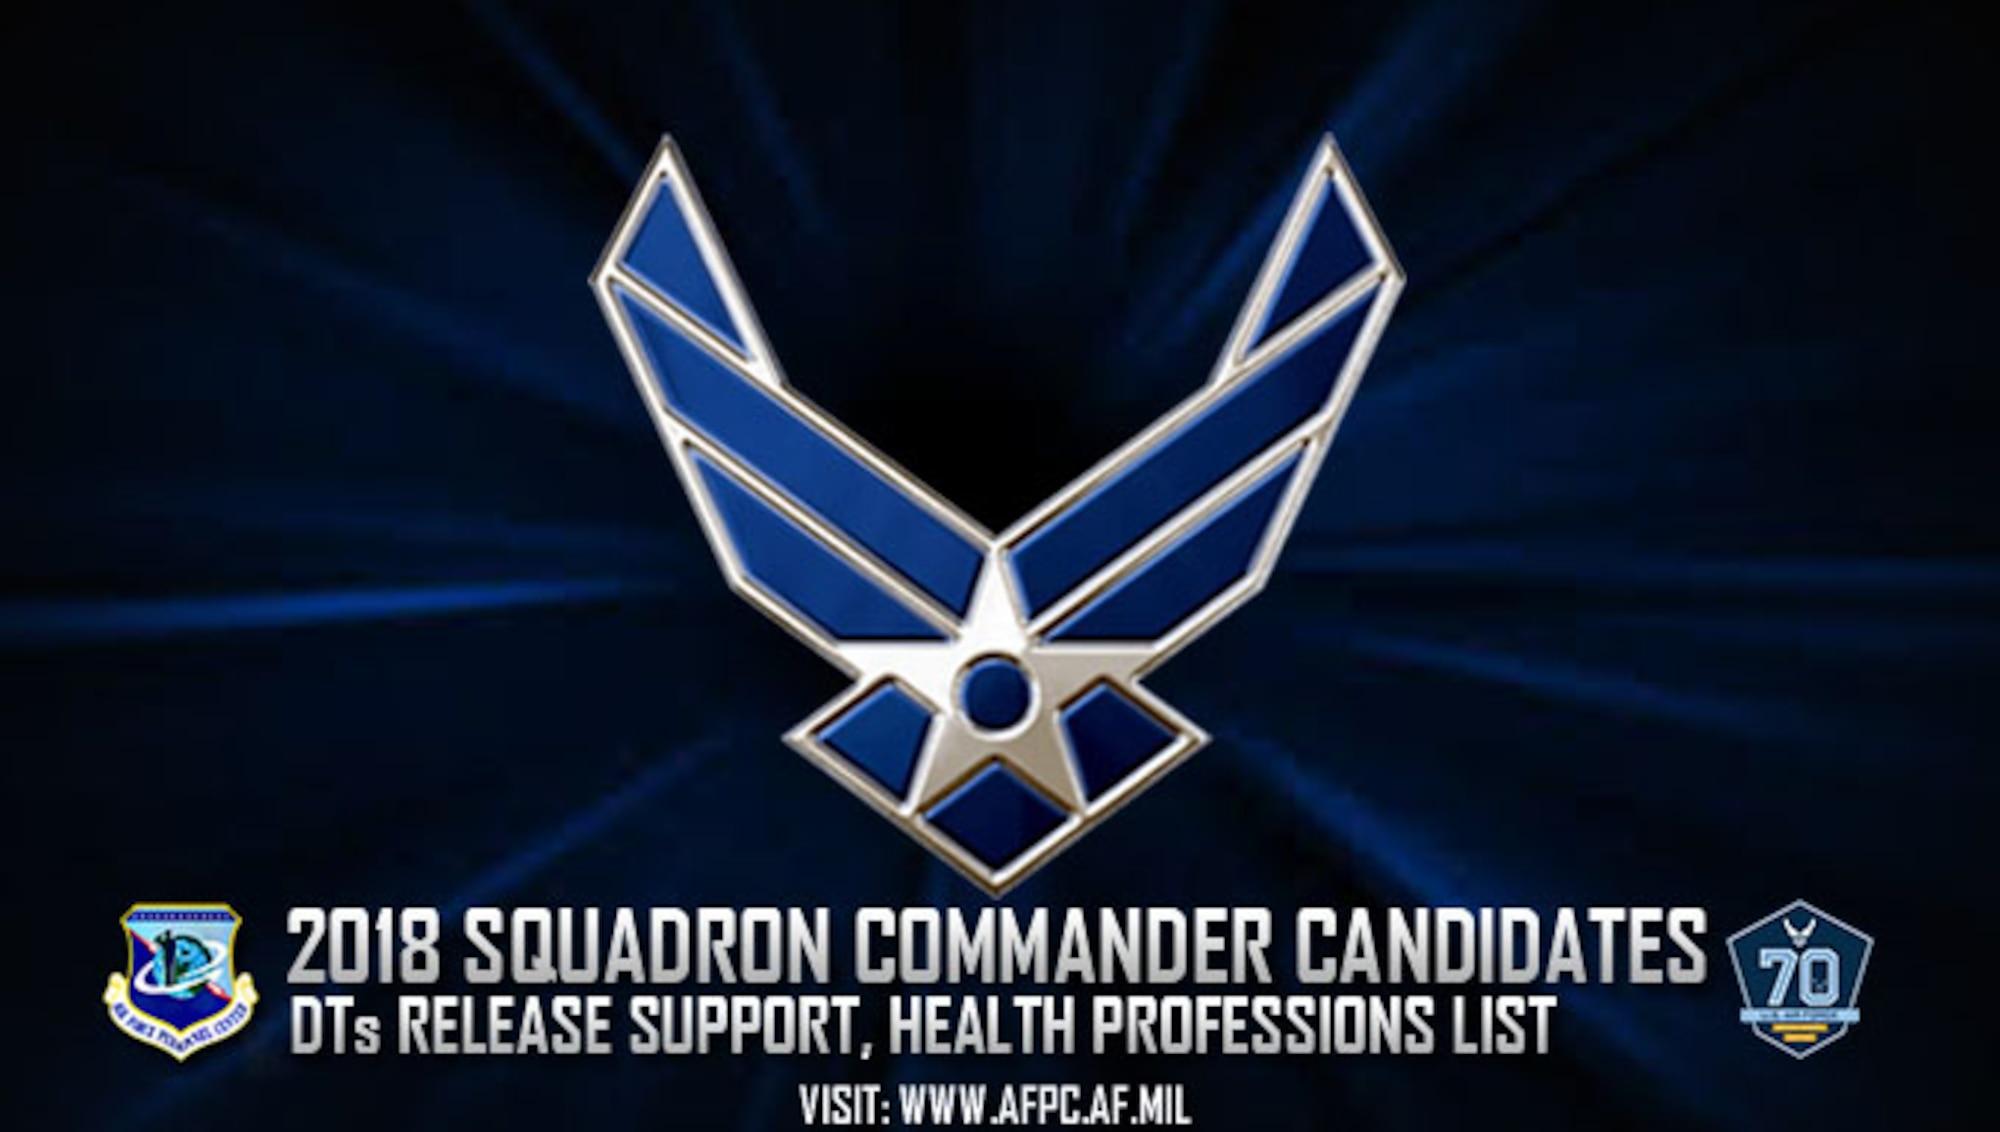 2018squadron commander candiates for support, health professions